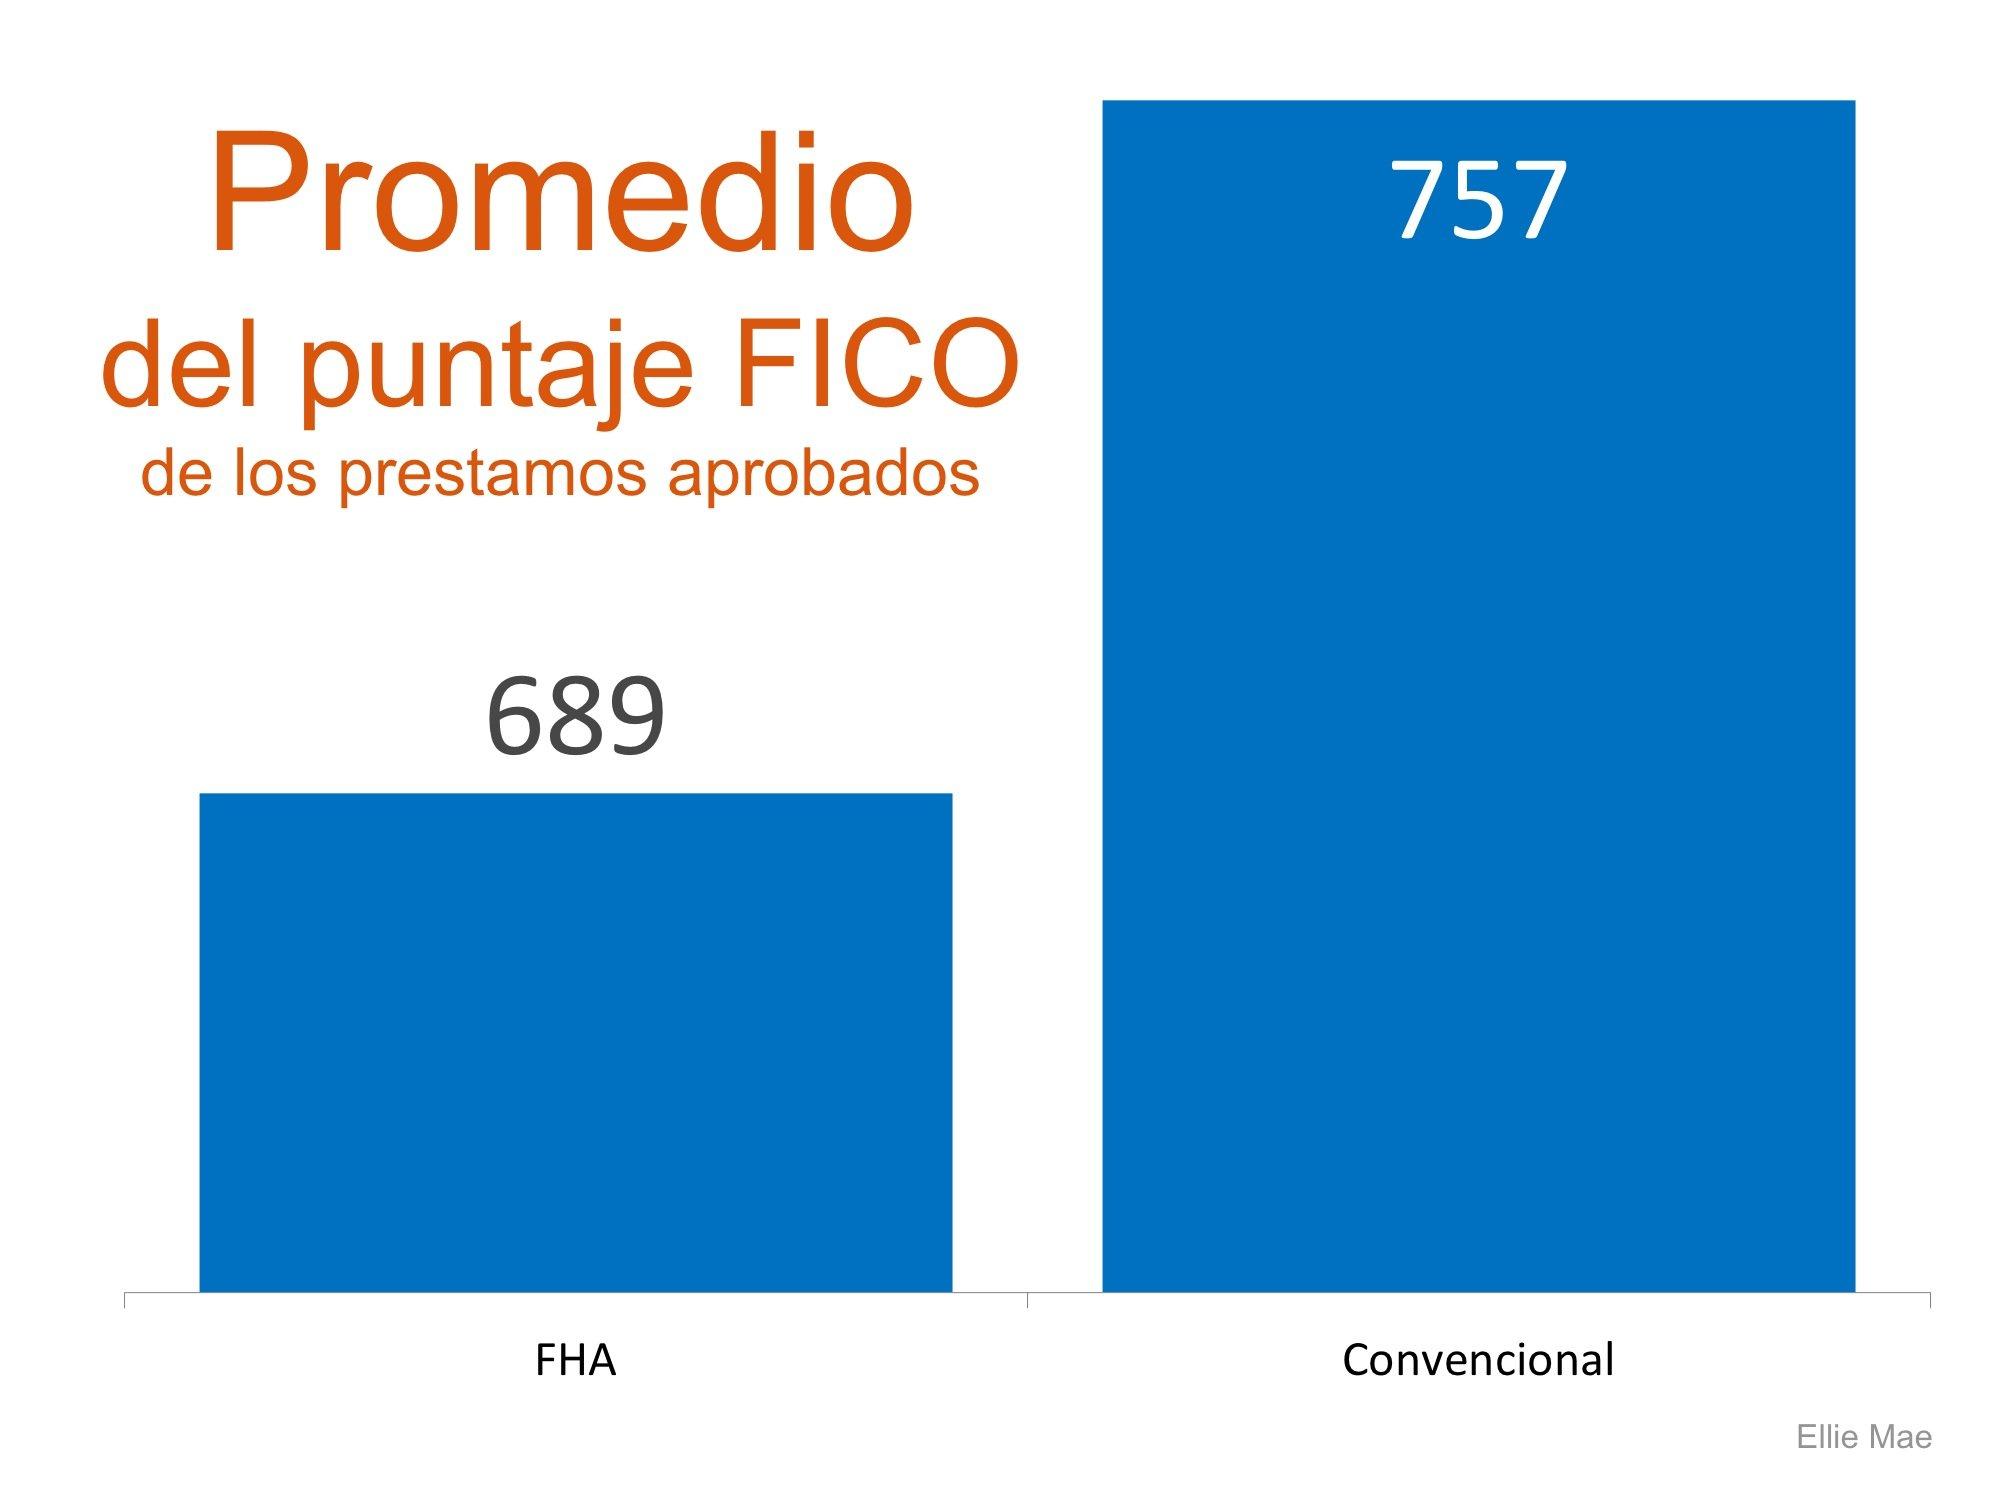 promedio del puntaje FICO - Simplifying The Market